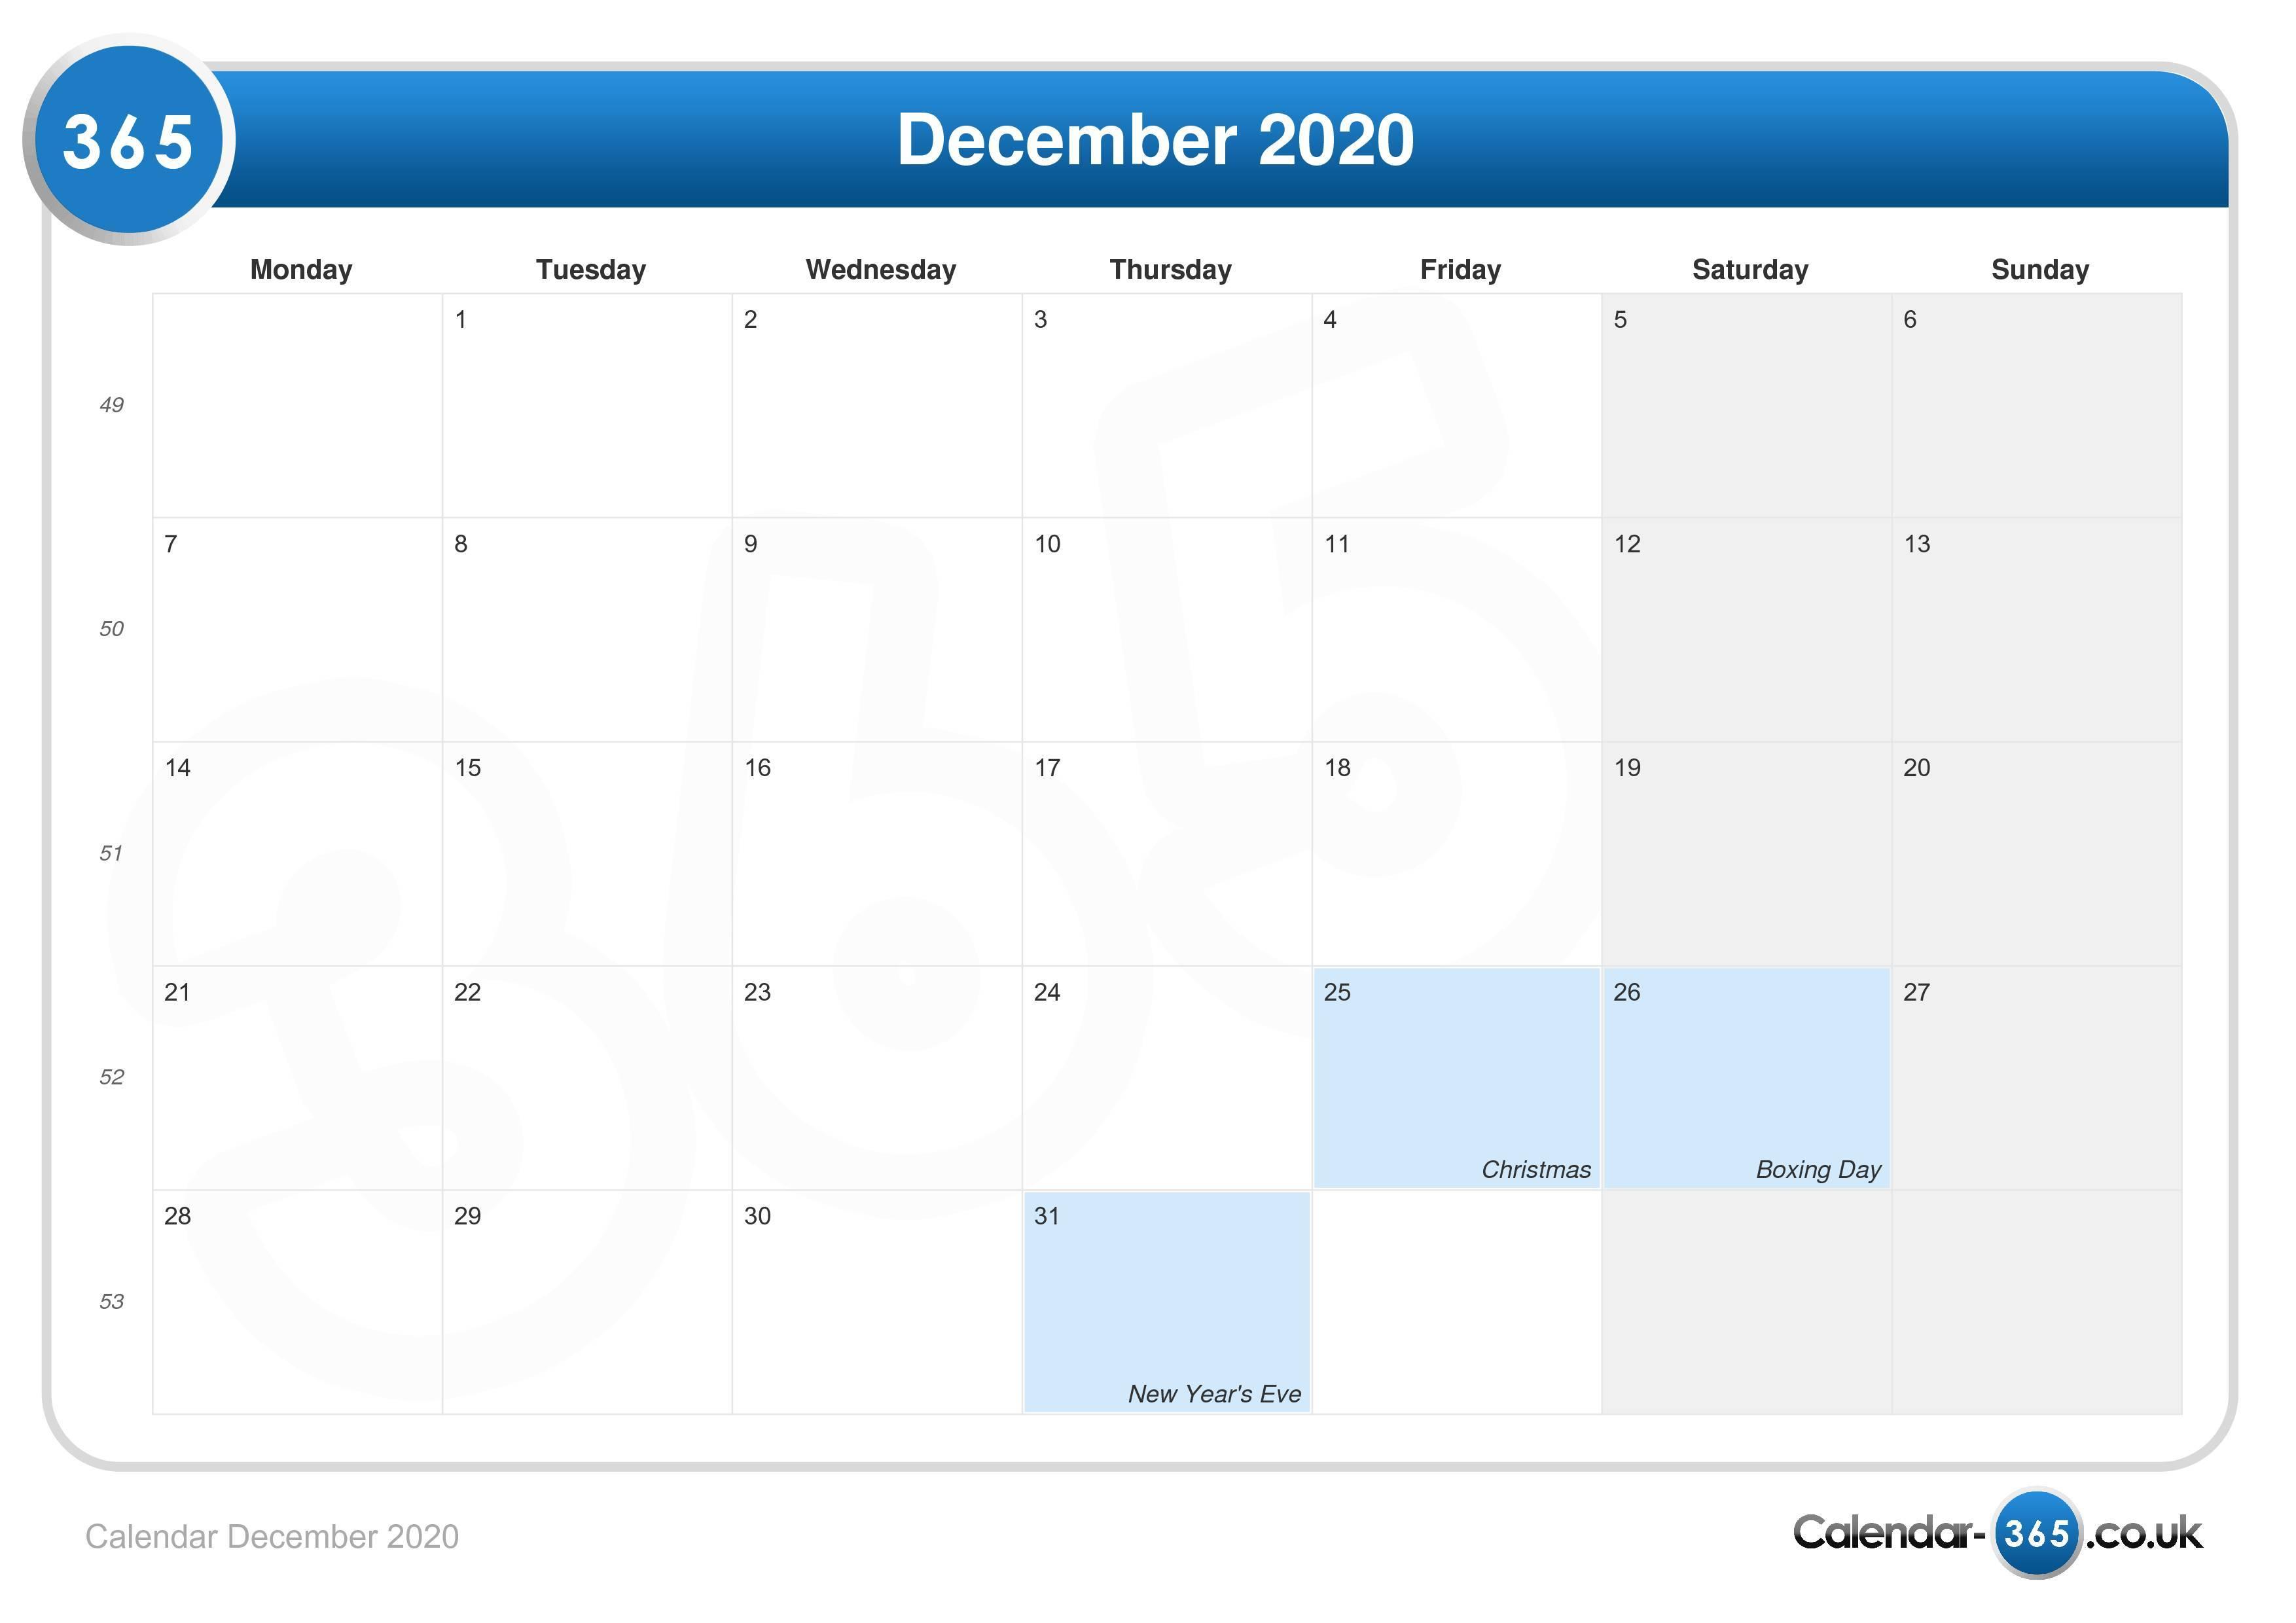 16th December 2020 Calendar Calendar December 2020